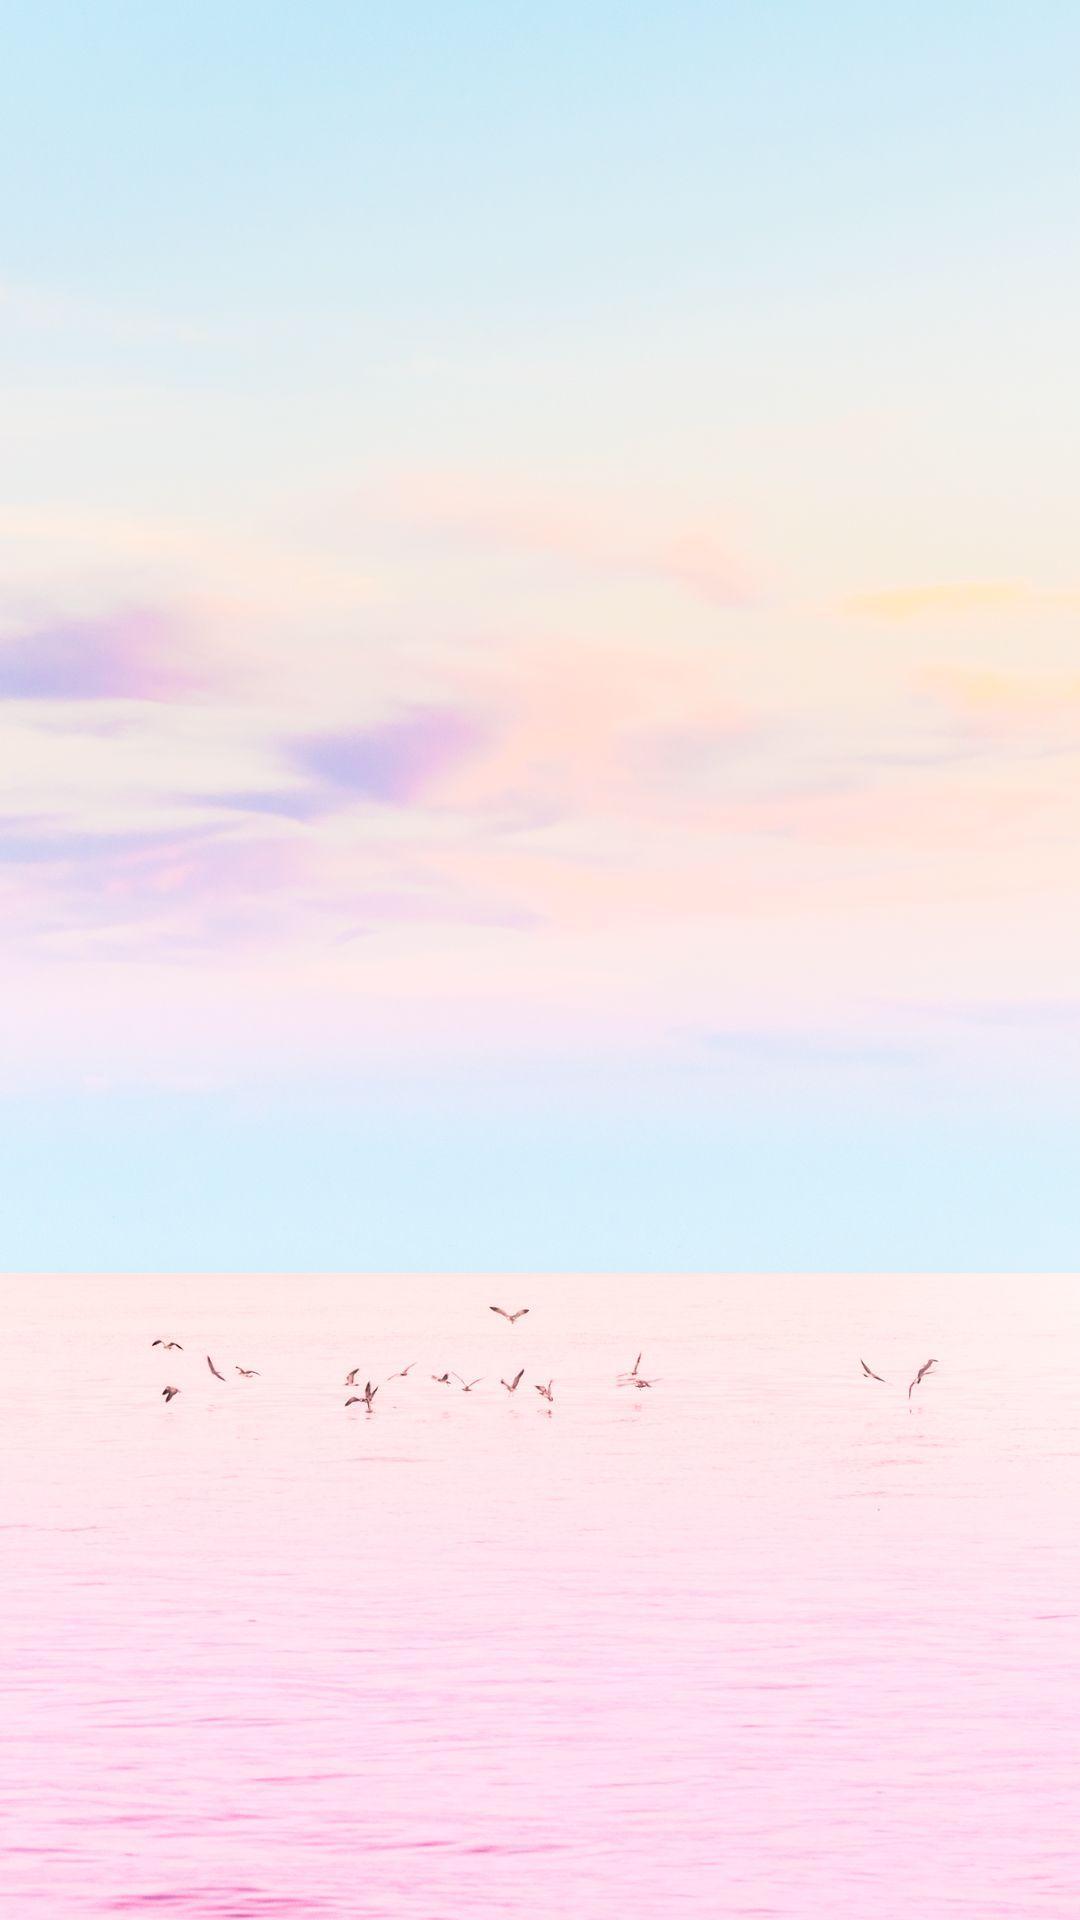 Wallpaper iphone tumblr pastel